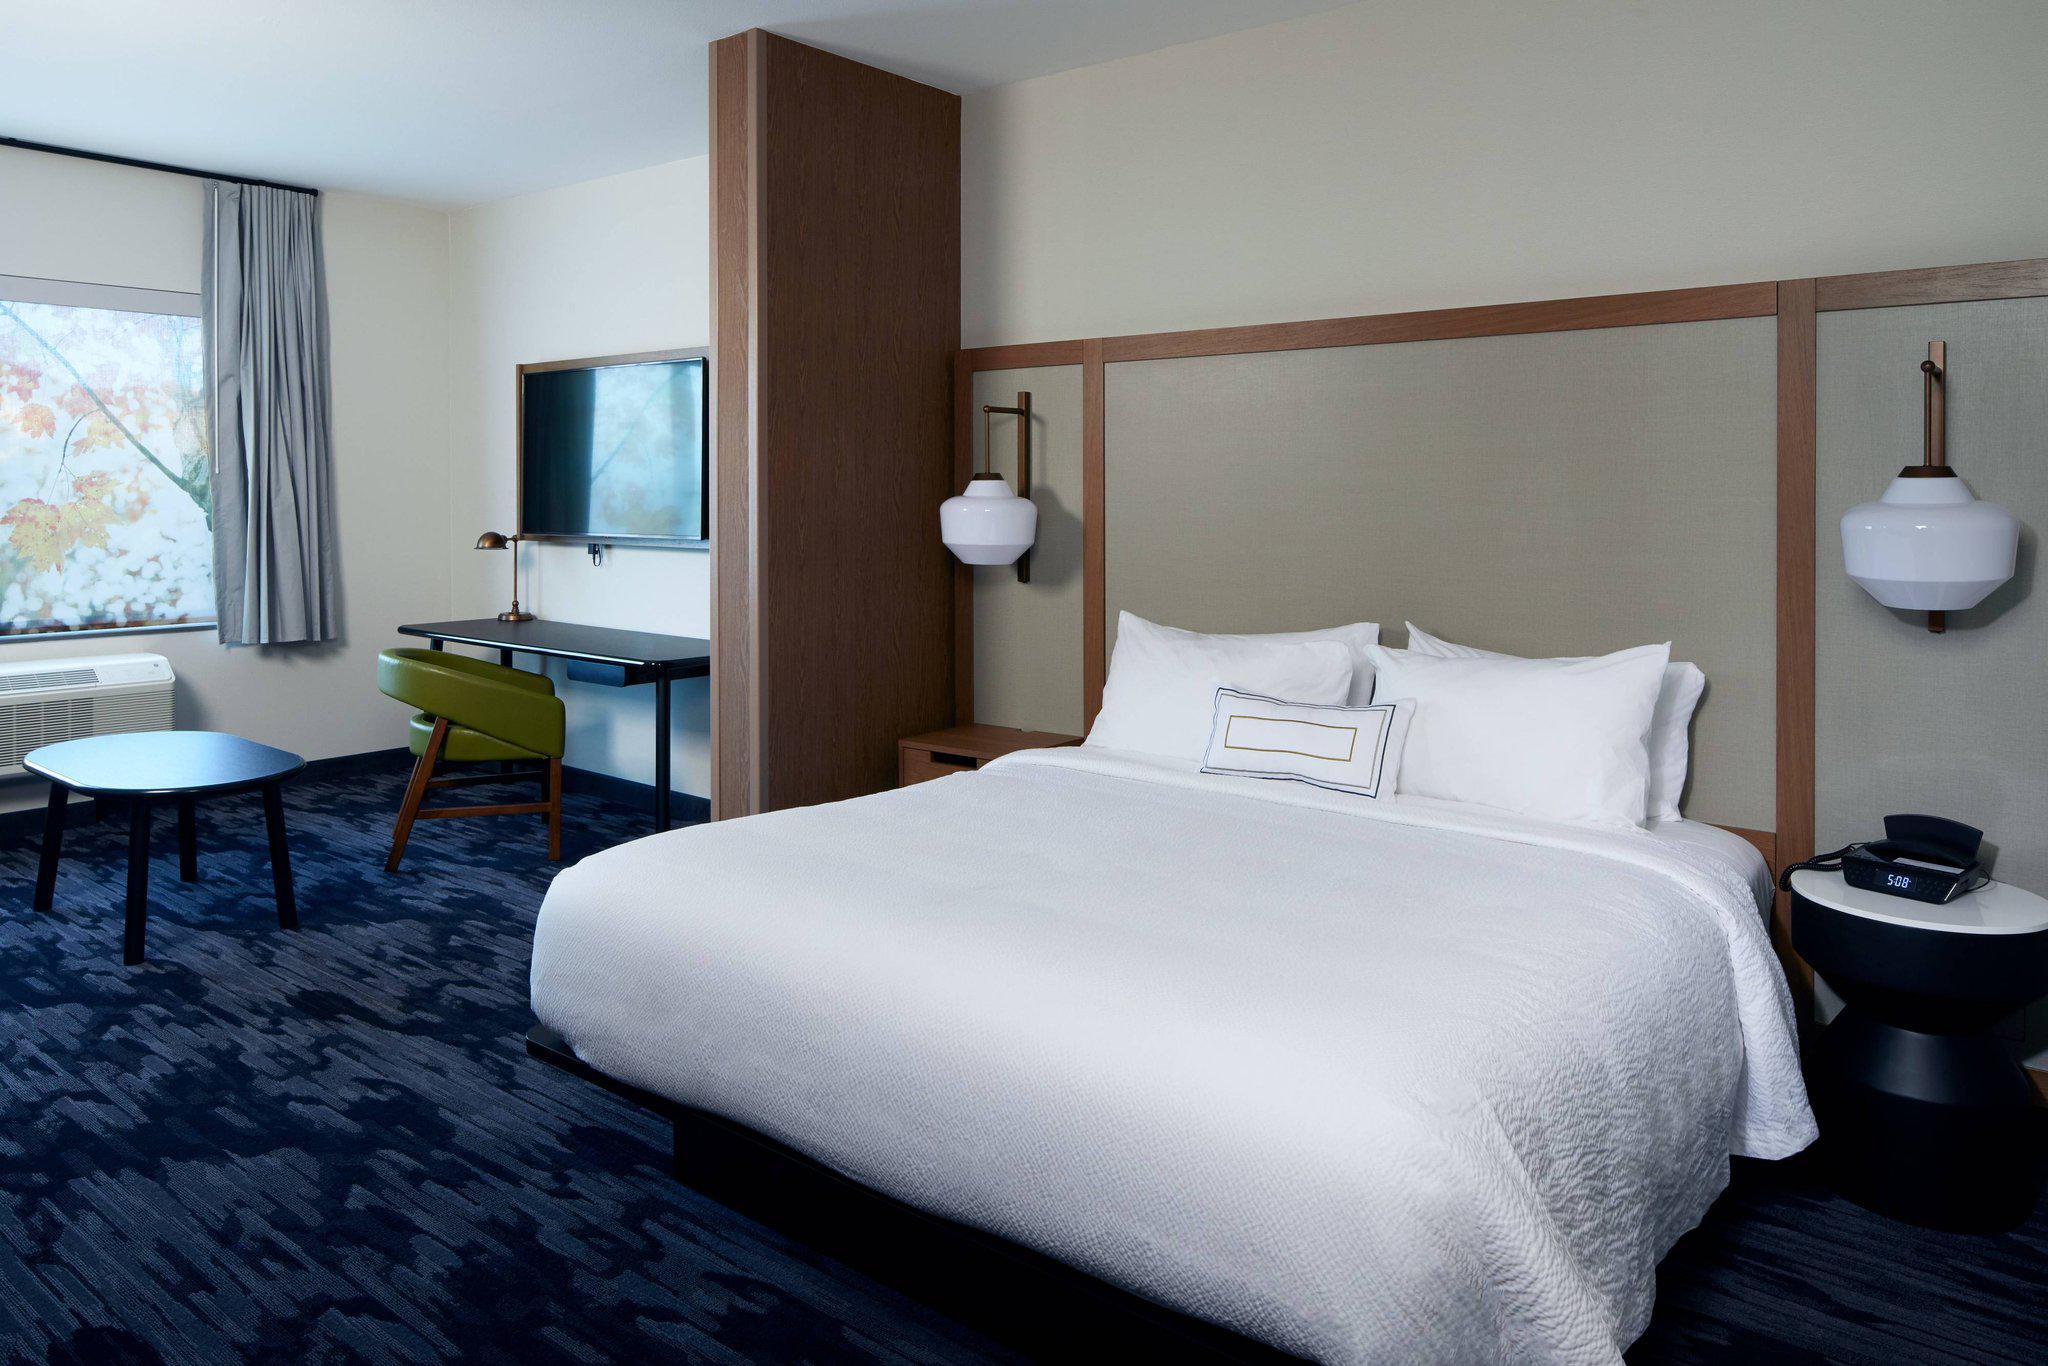 Fairfield Inn & Suites by Marriott Riverside Moreno Valley